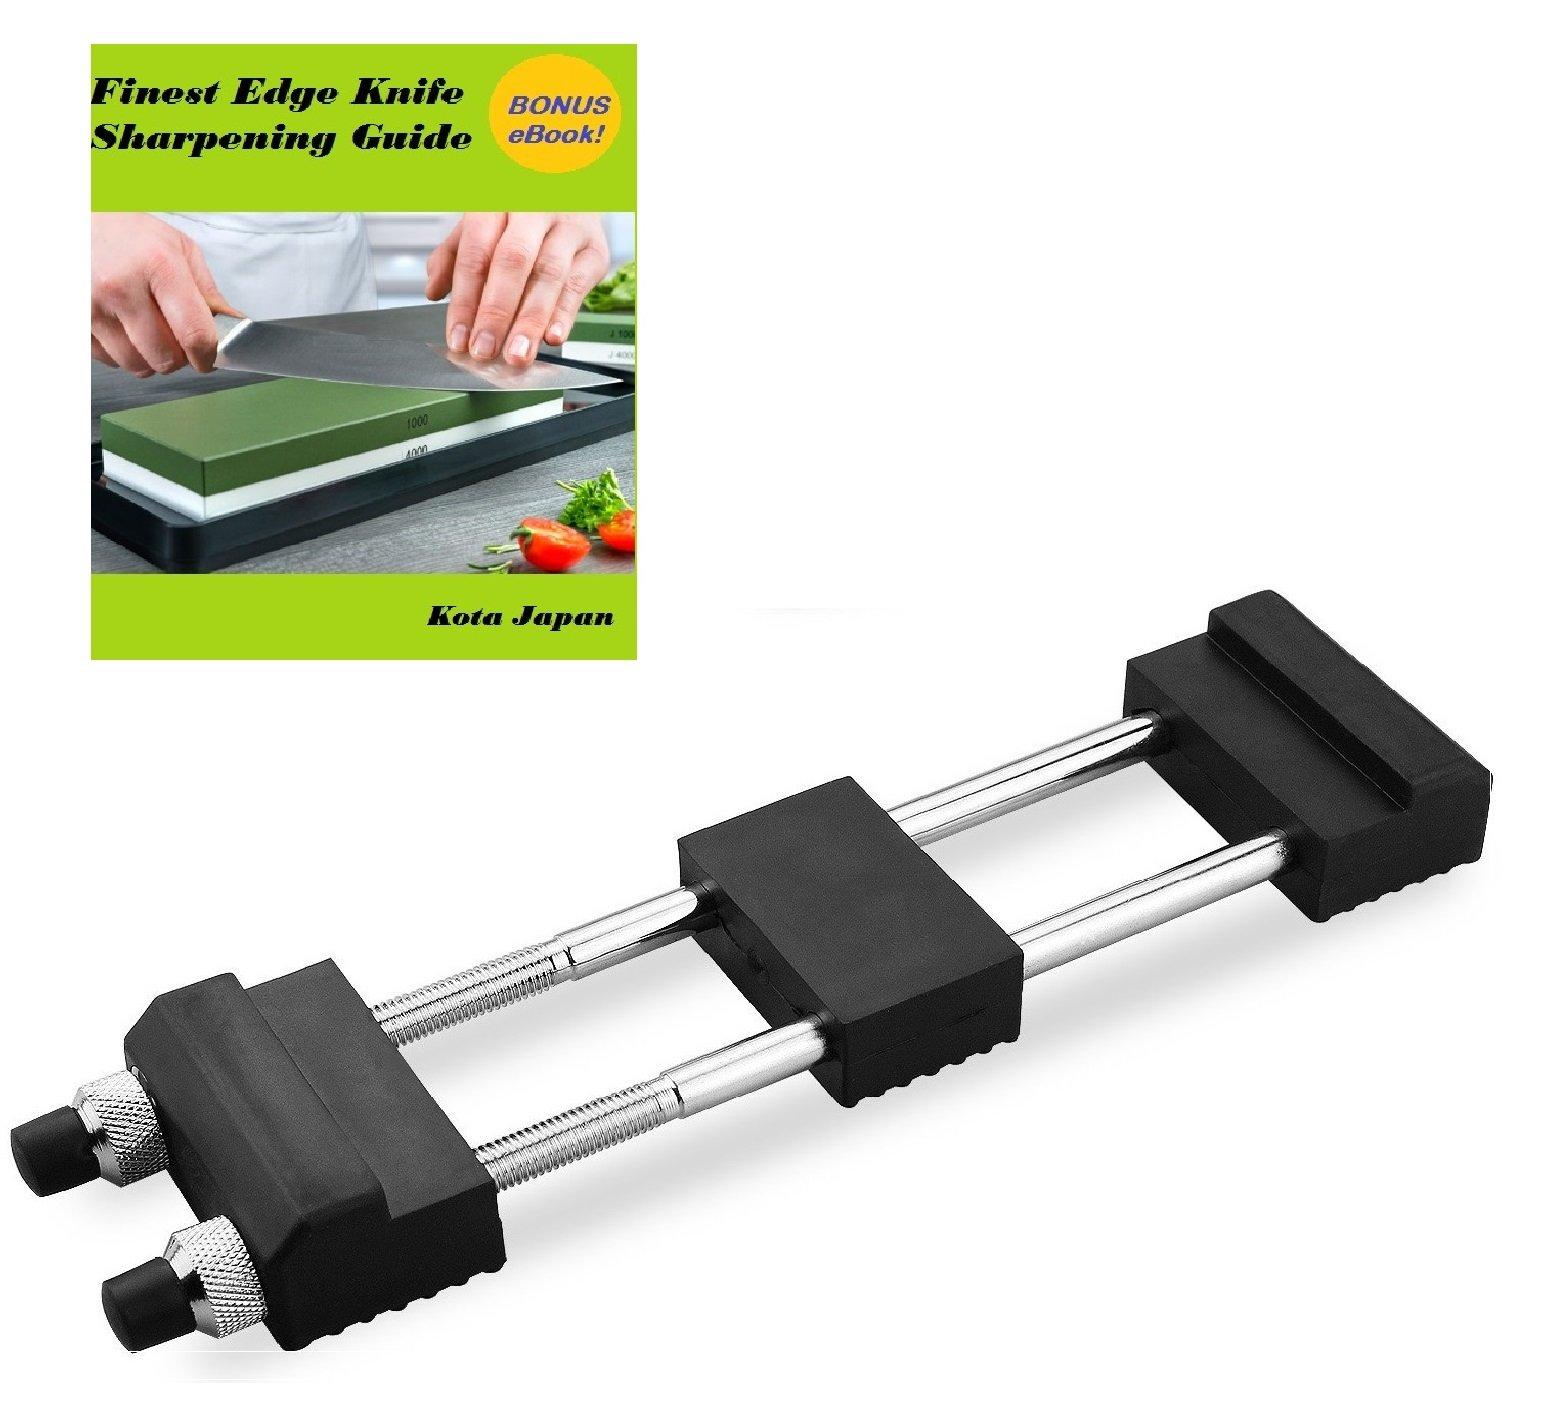 Diamond Sharp Universal Sharpening Whetstone and Bench Stone Sharpener Holder with Adjustable No-Slip Base & FREE e-Book